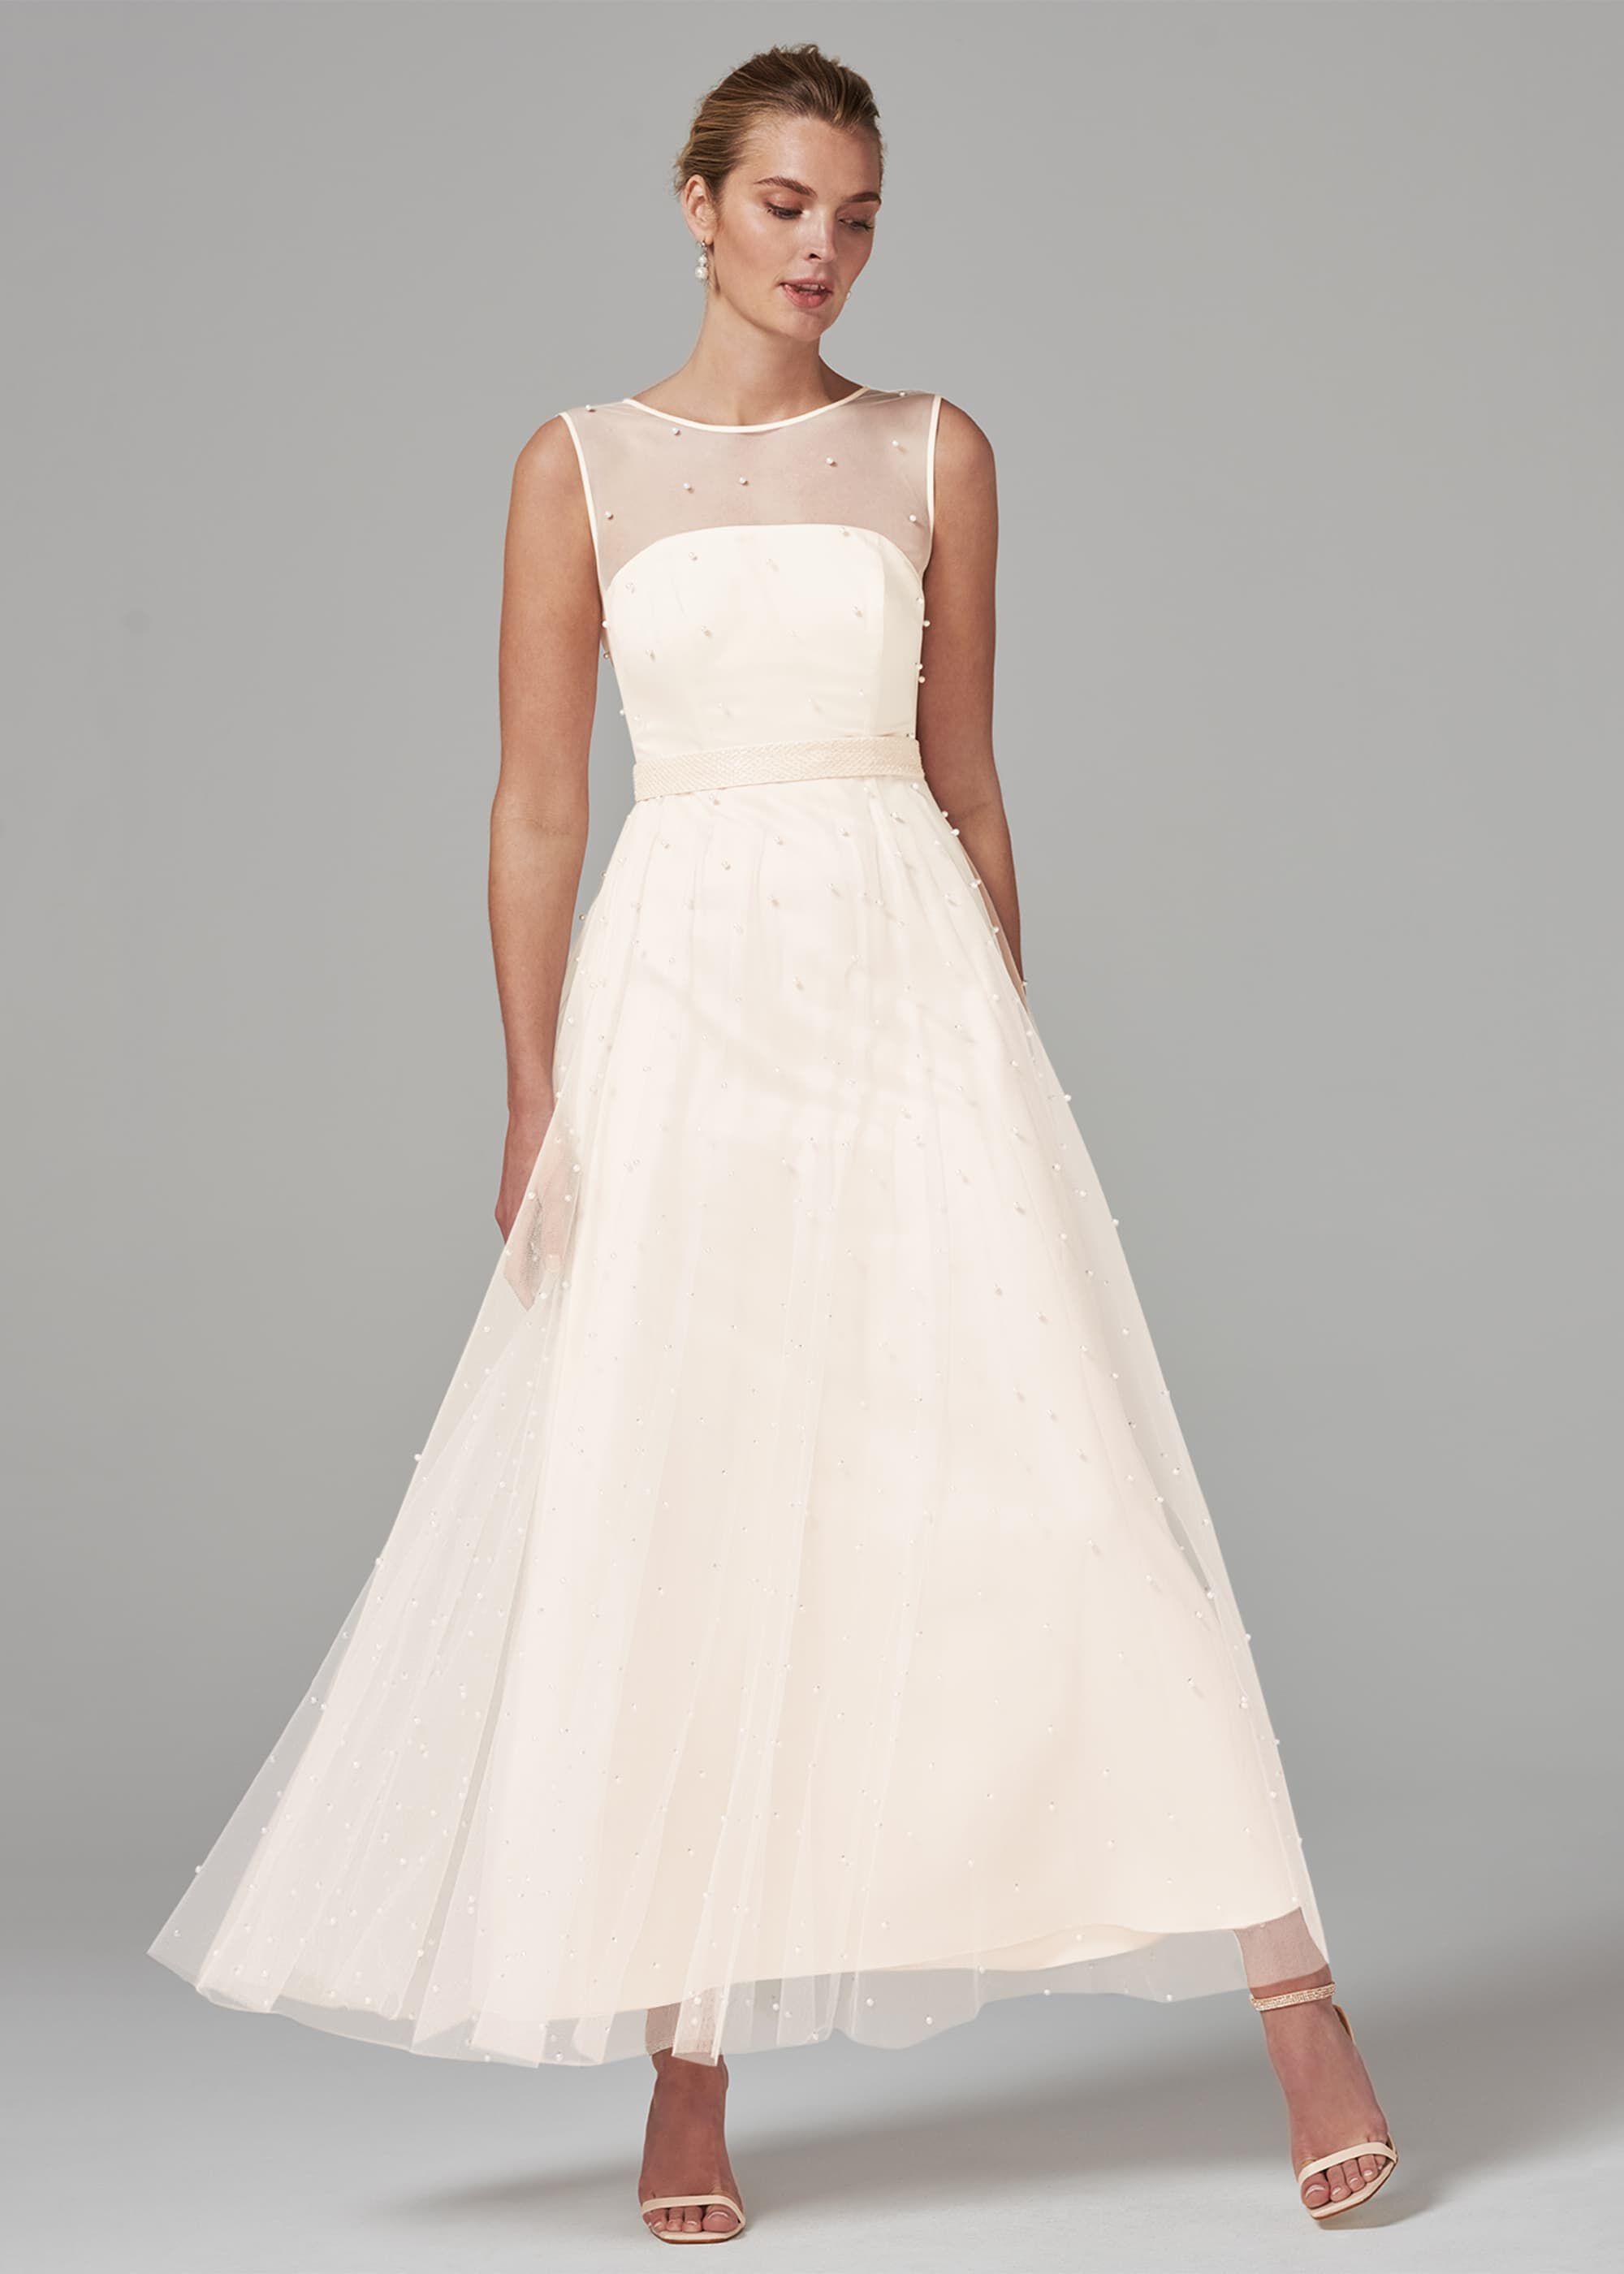 Genova Beaded Wedding Dress | Phase Eight